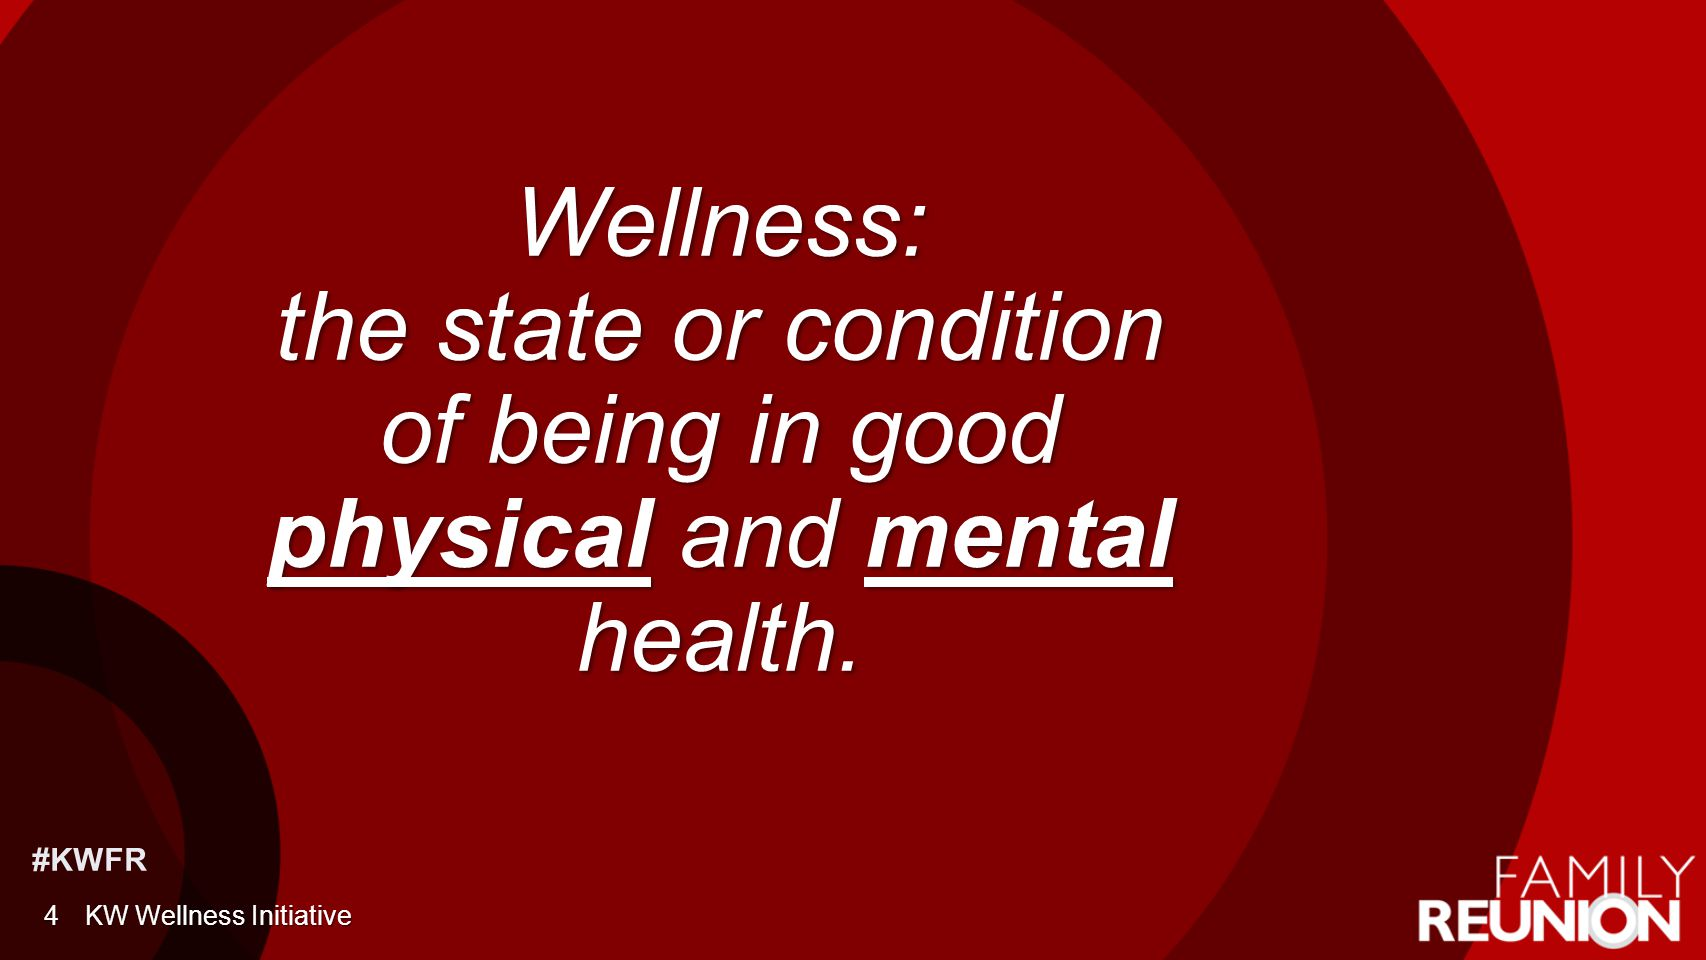 Holistic View of Wellness PhysicalPhysical EmotionalEmotional IntellectualIntellectual FinancialFinancial 5 OccupationalOccupational SpiritualSpiritual SocialSocial EnvironmentalEnvironmental KW Wellness Initiative